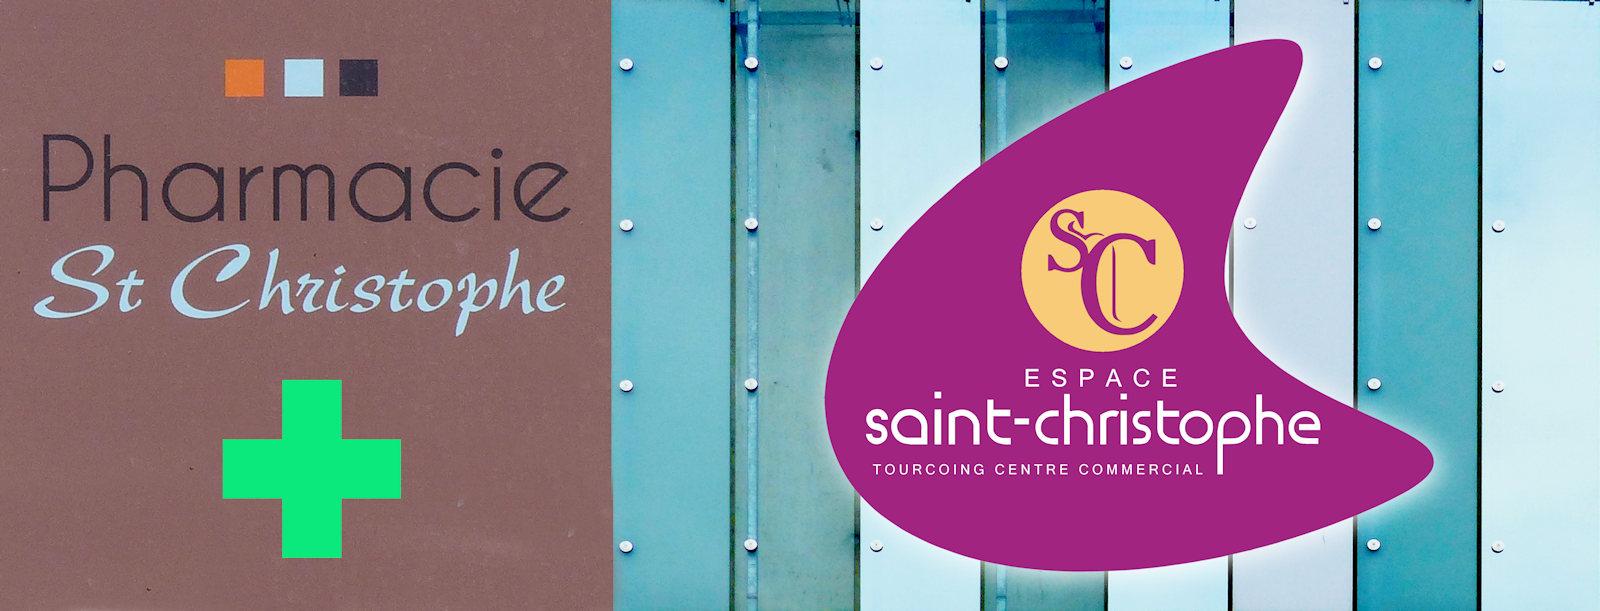 Pharmacie Saint Christophe - Espace Saint Christophe, Tourcoing